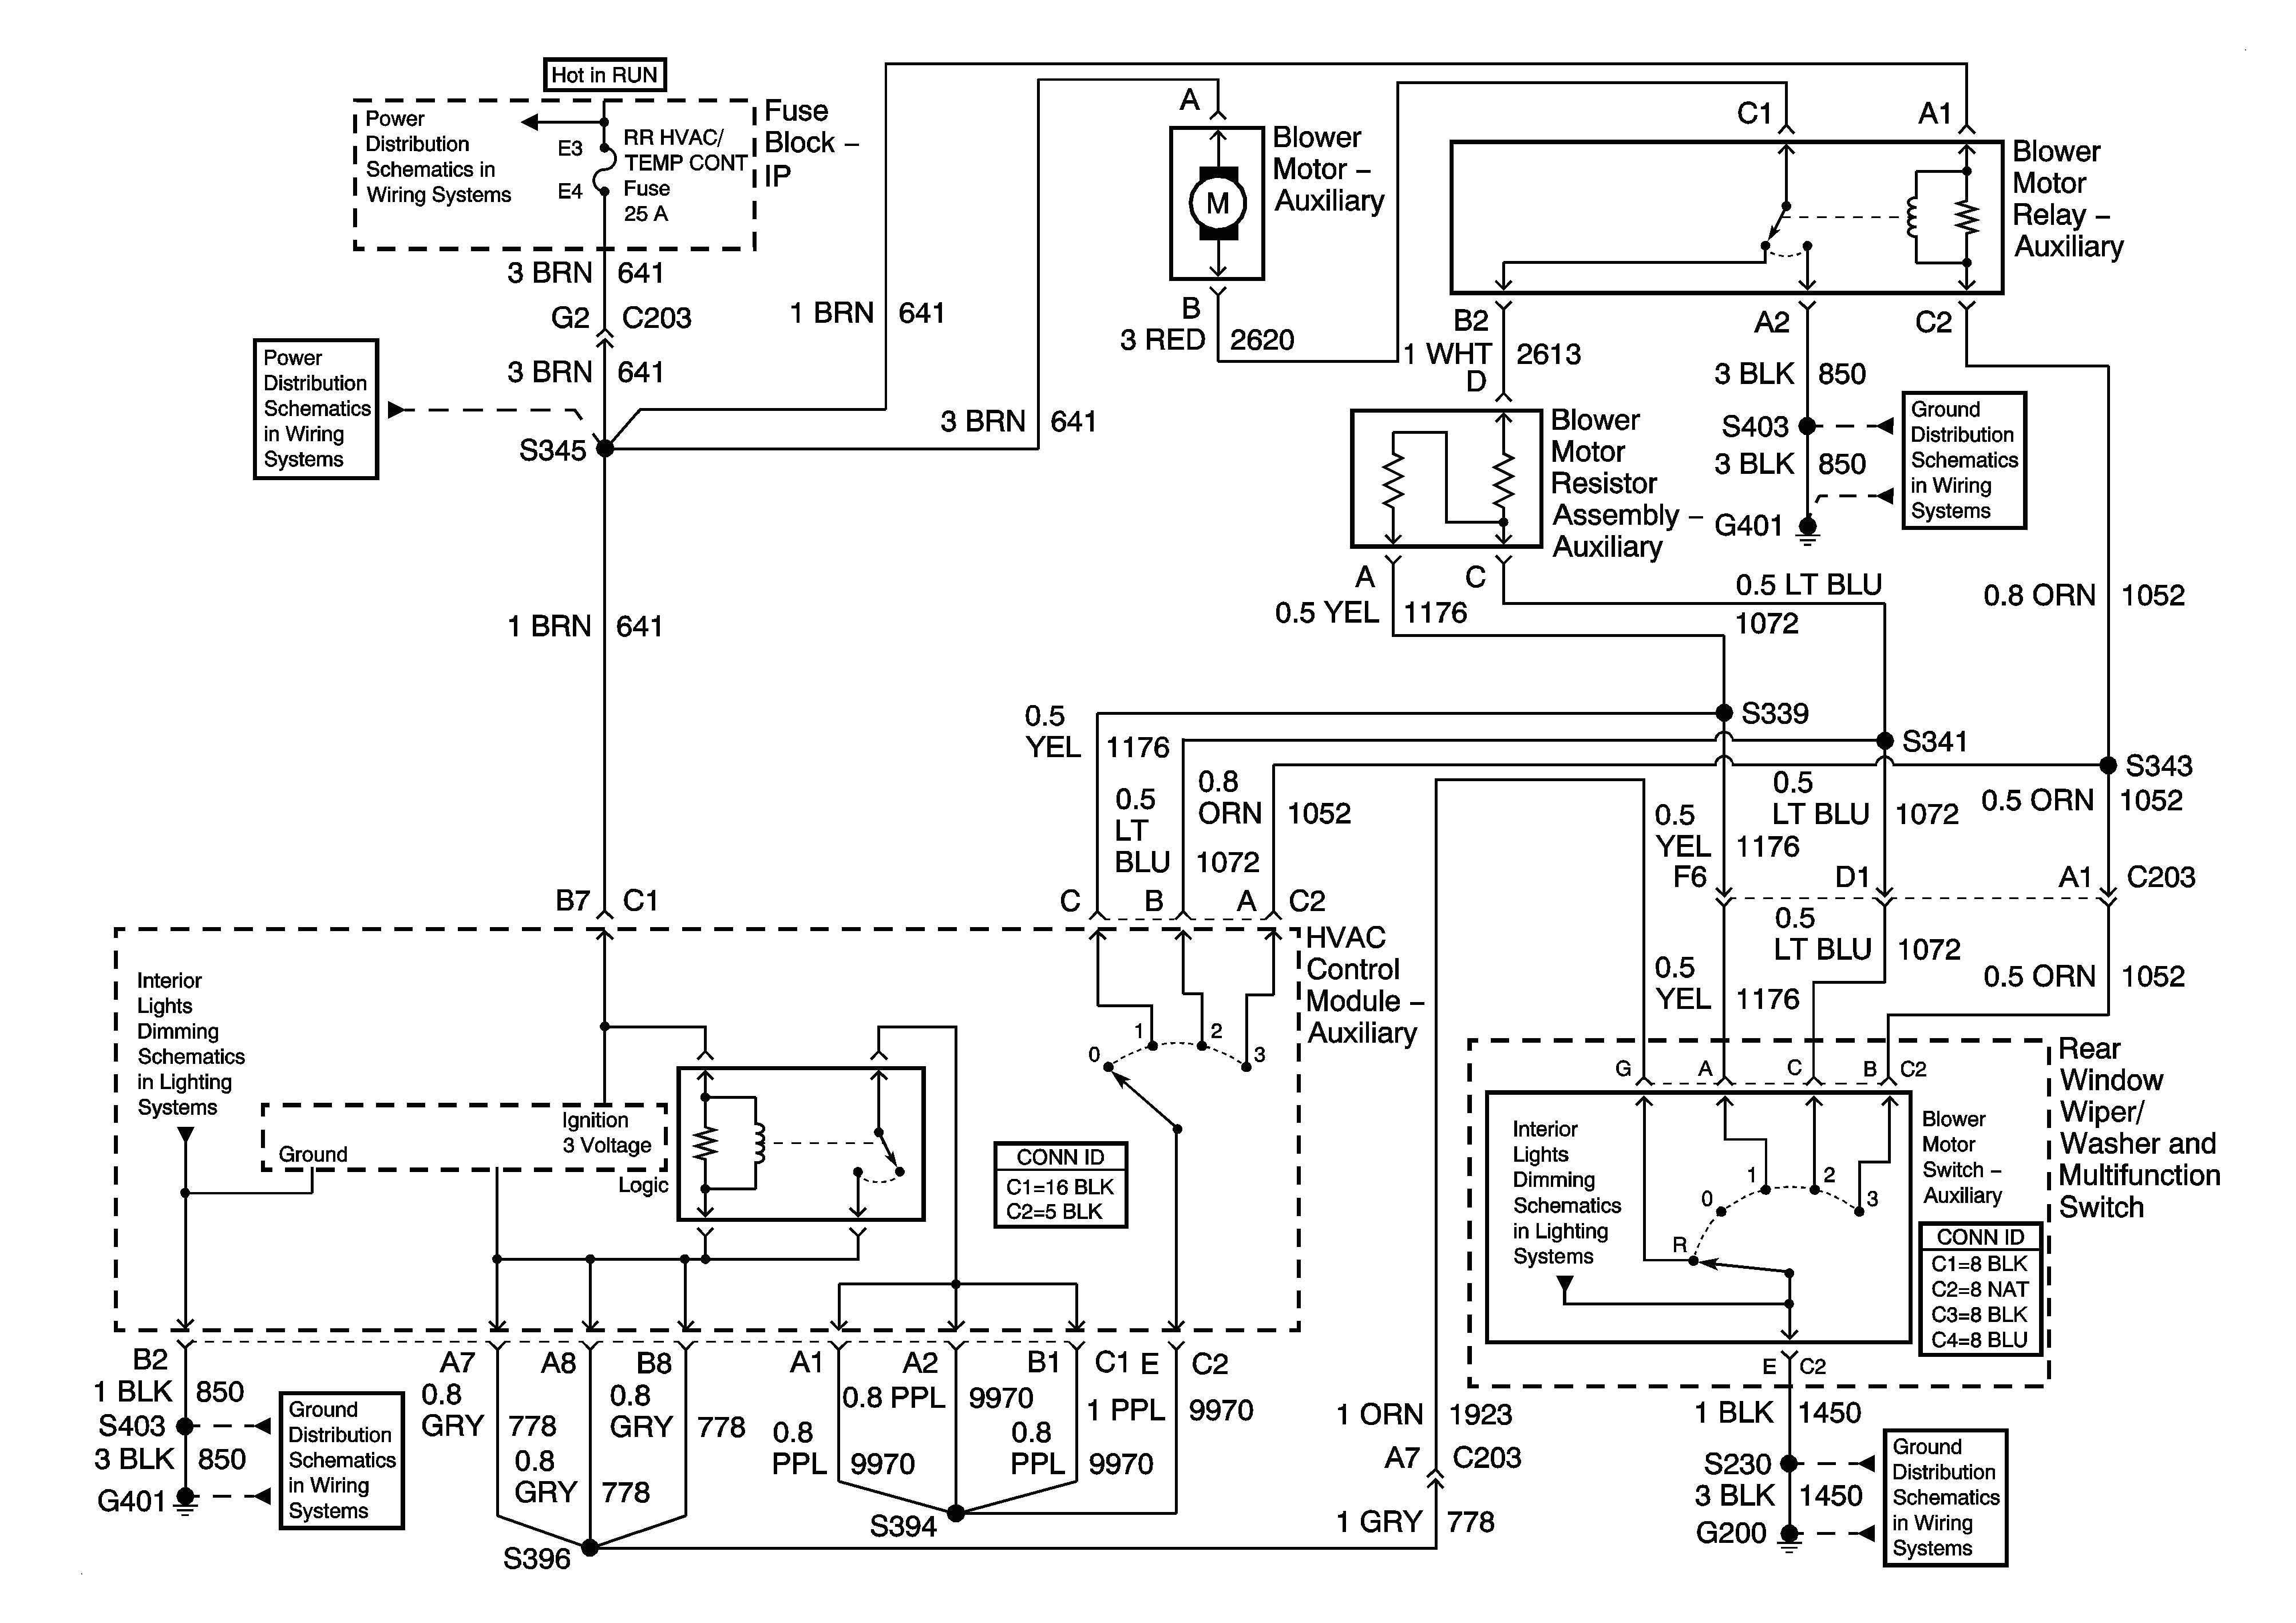 kicker cxa600 1 wiring diagram best of kicker cxa600 1 wiring diagram rate kicker cxa600 1